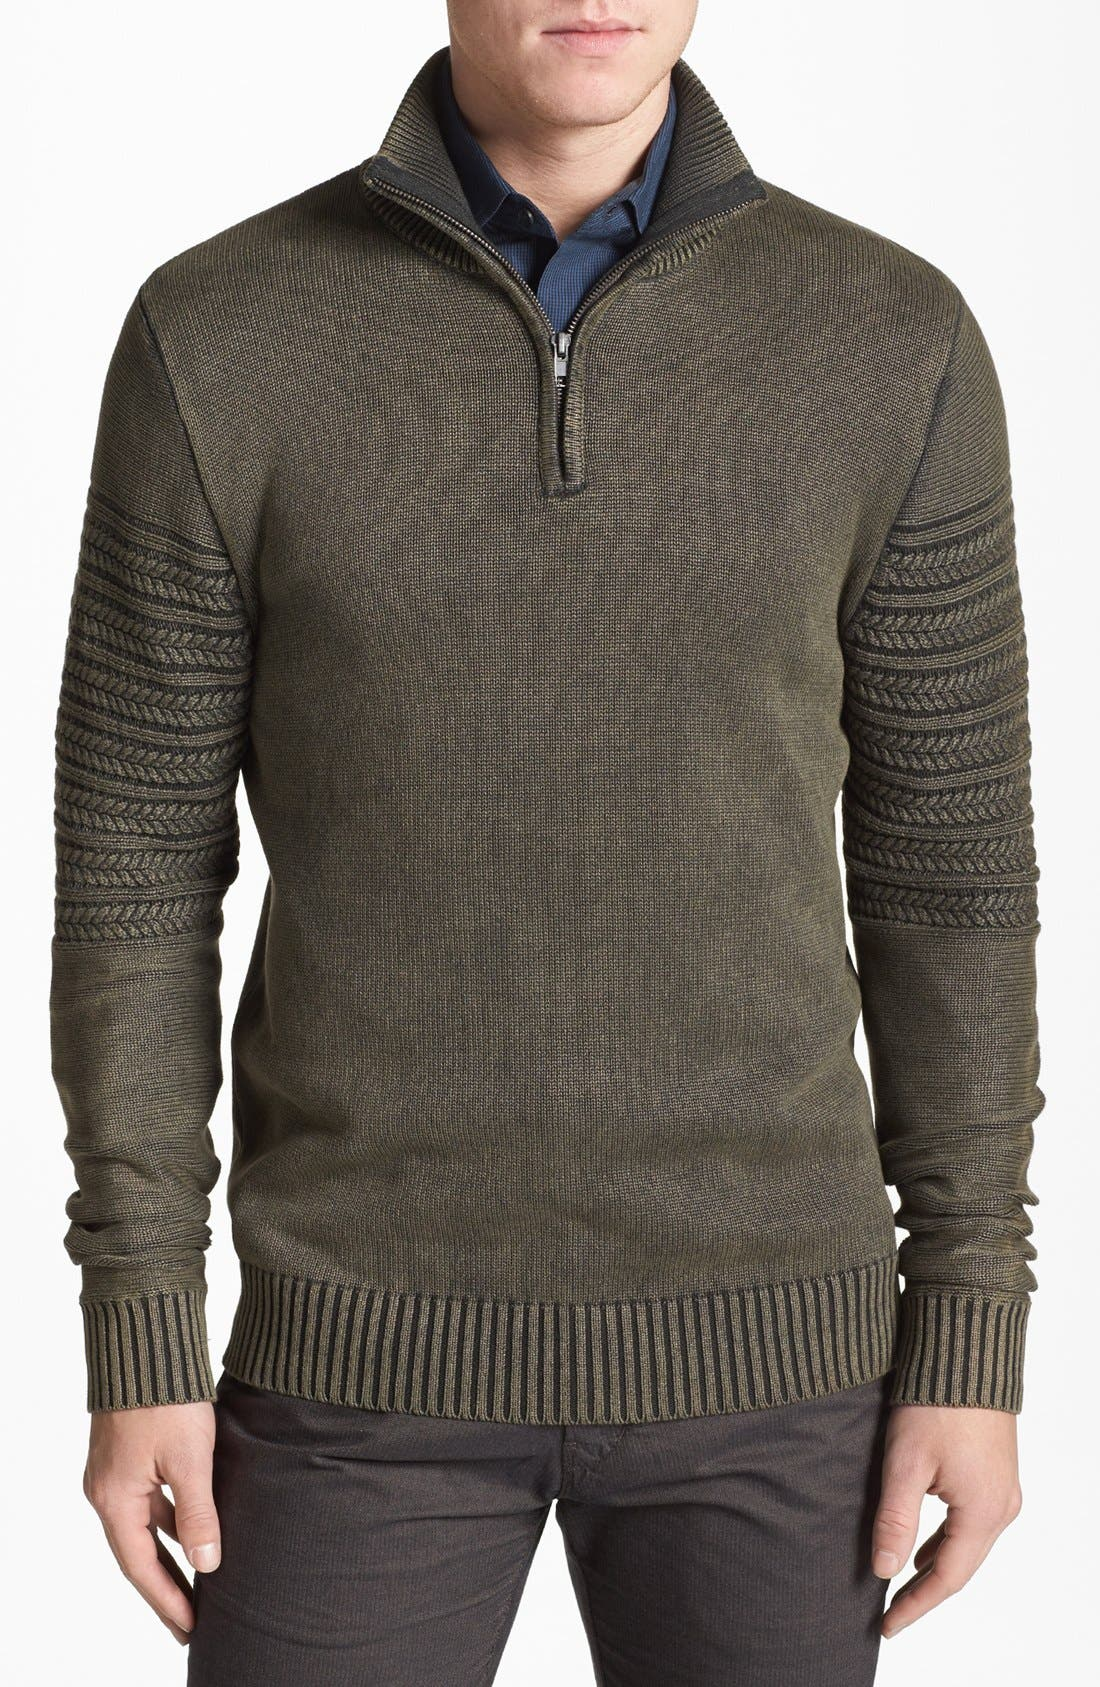 Alternate Image 1 Selected - Vince Camuto Slim Fit Half Zip Sweater